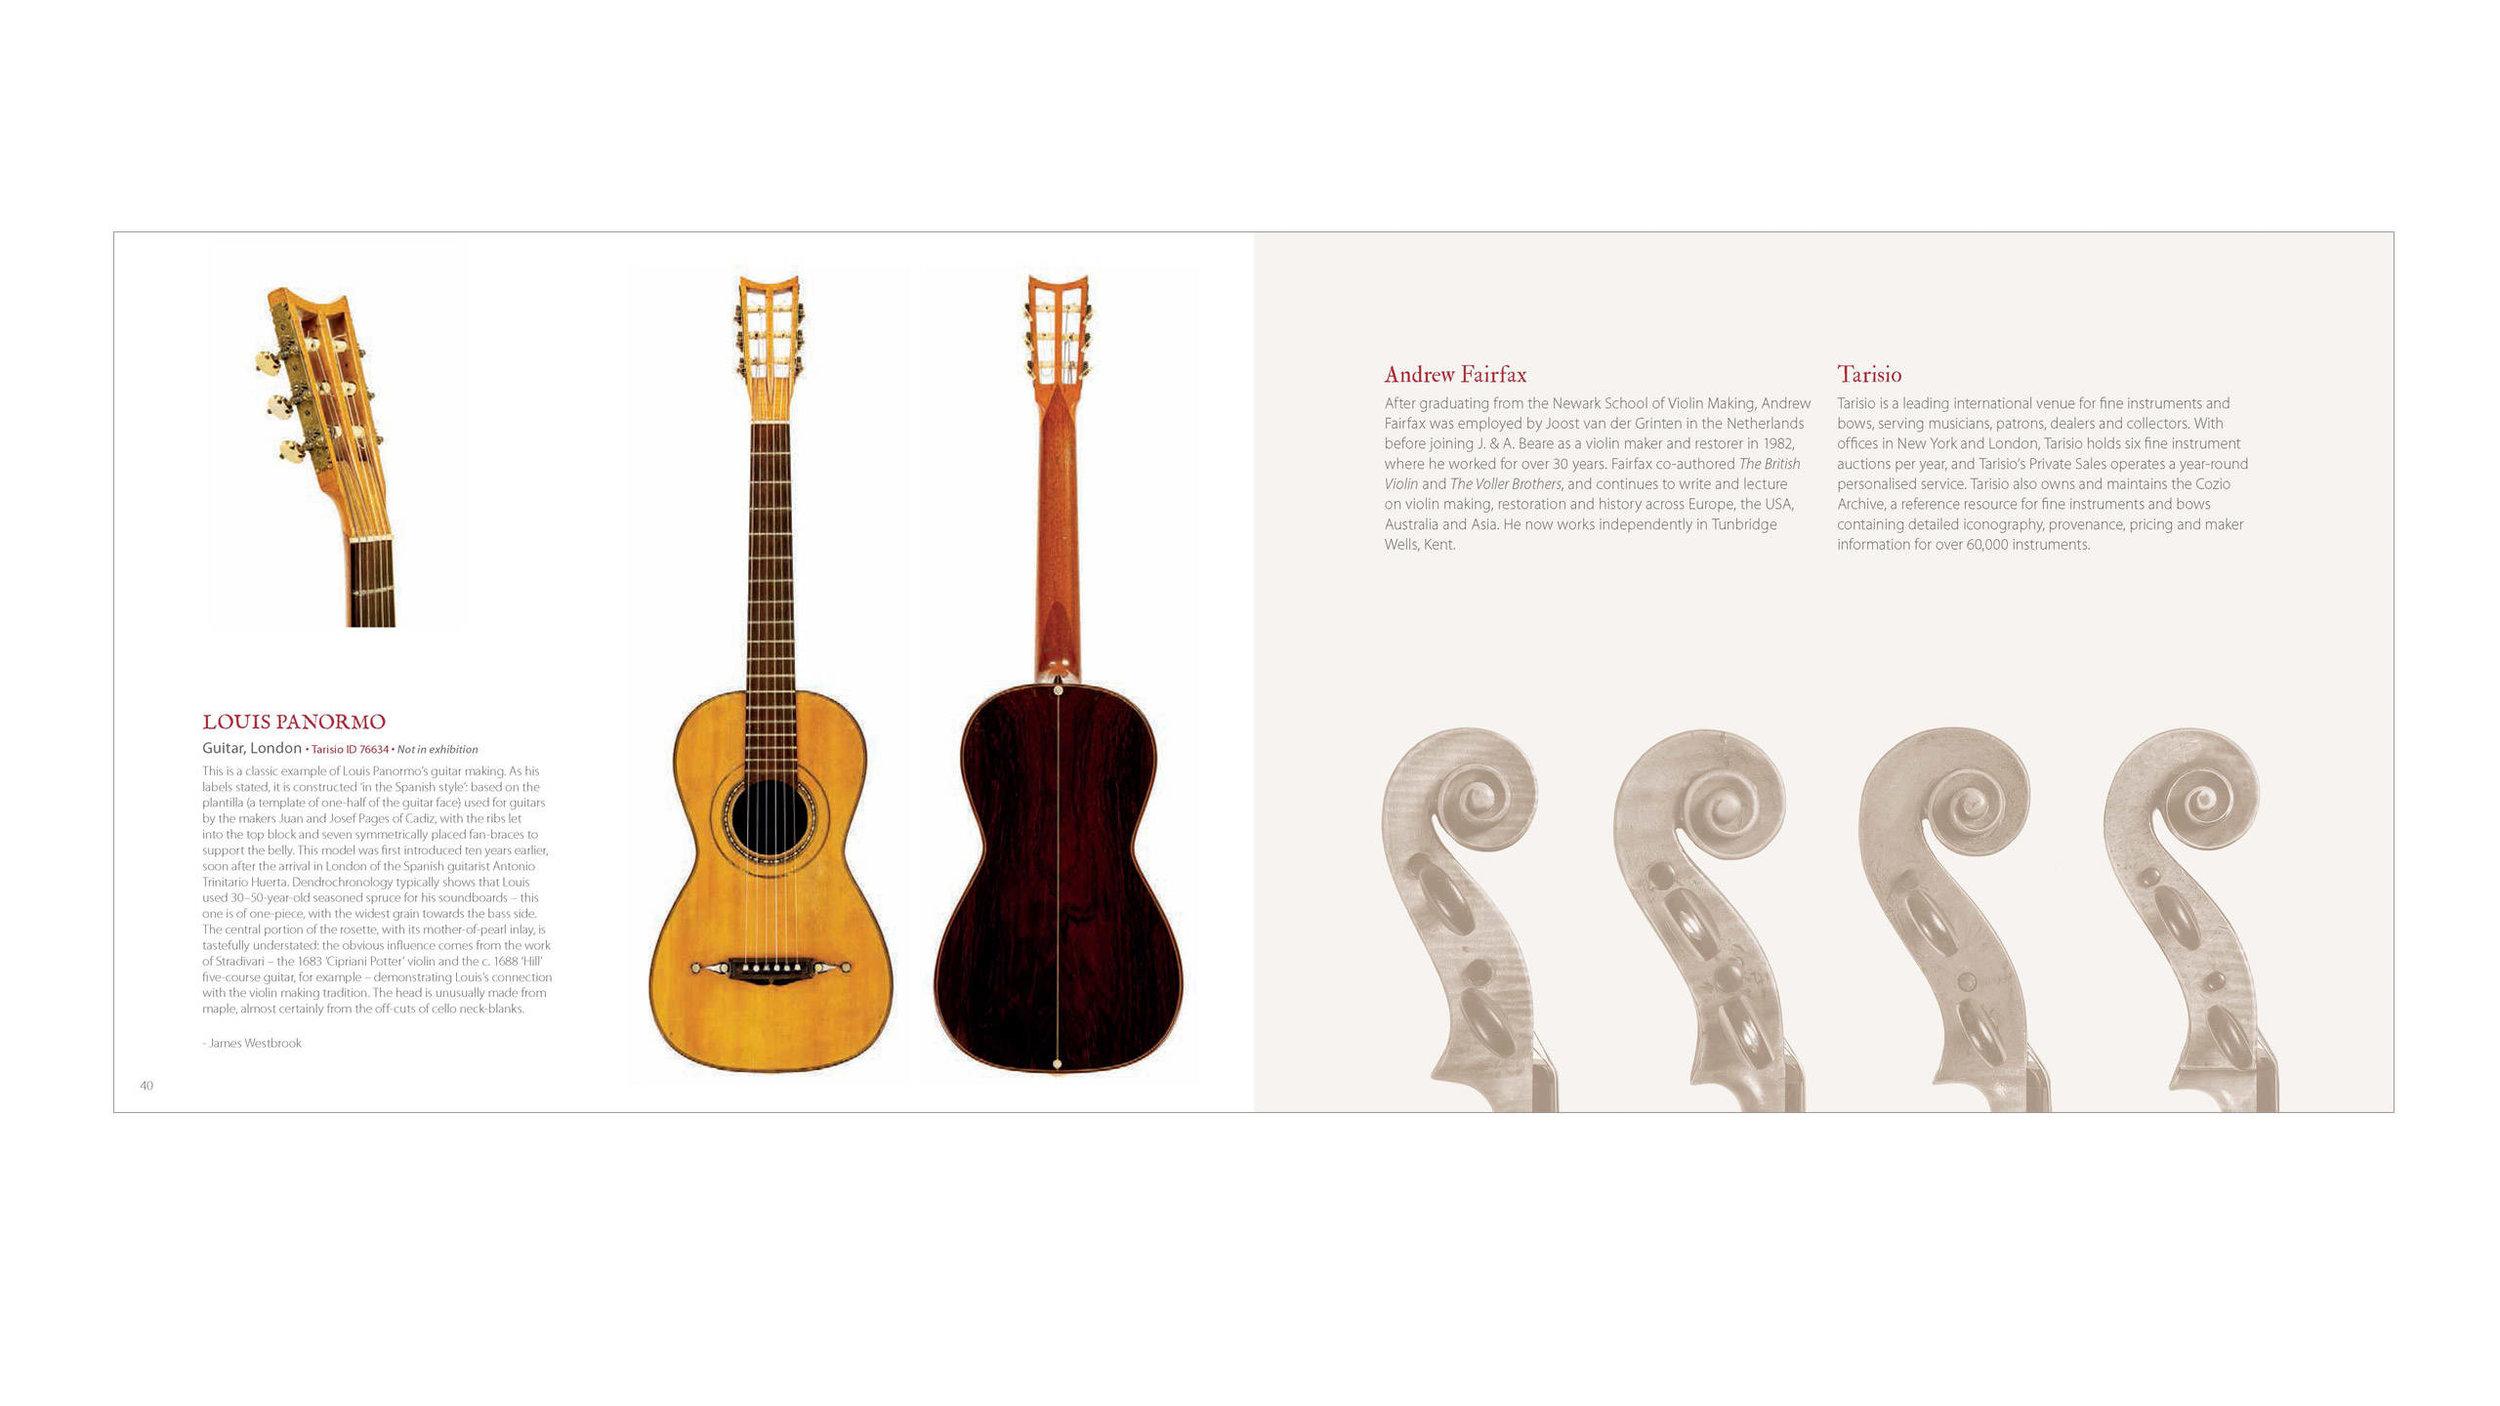 guitar1_2.jpg